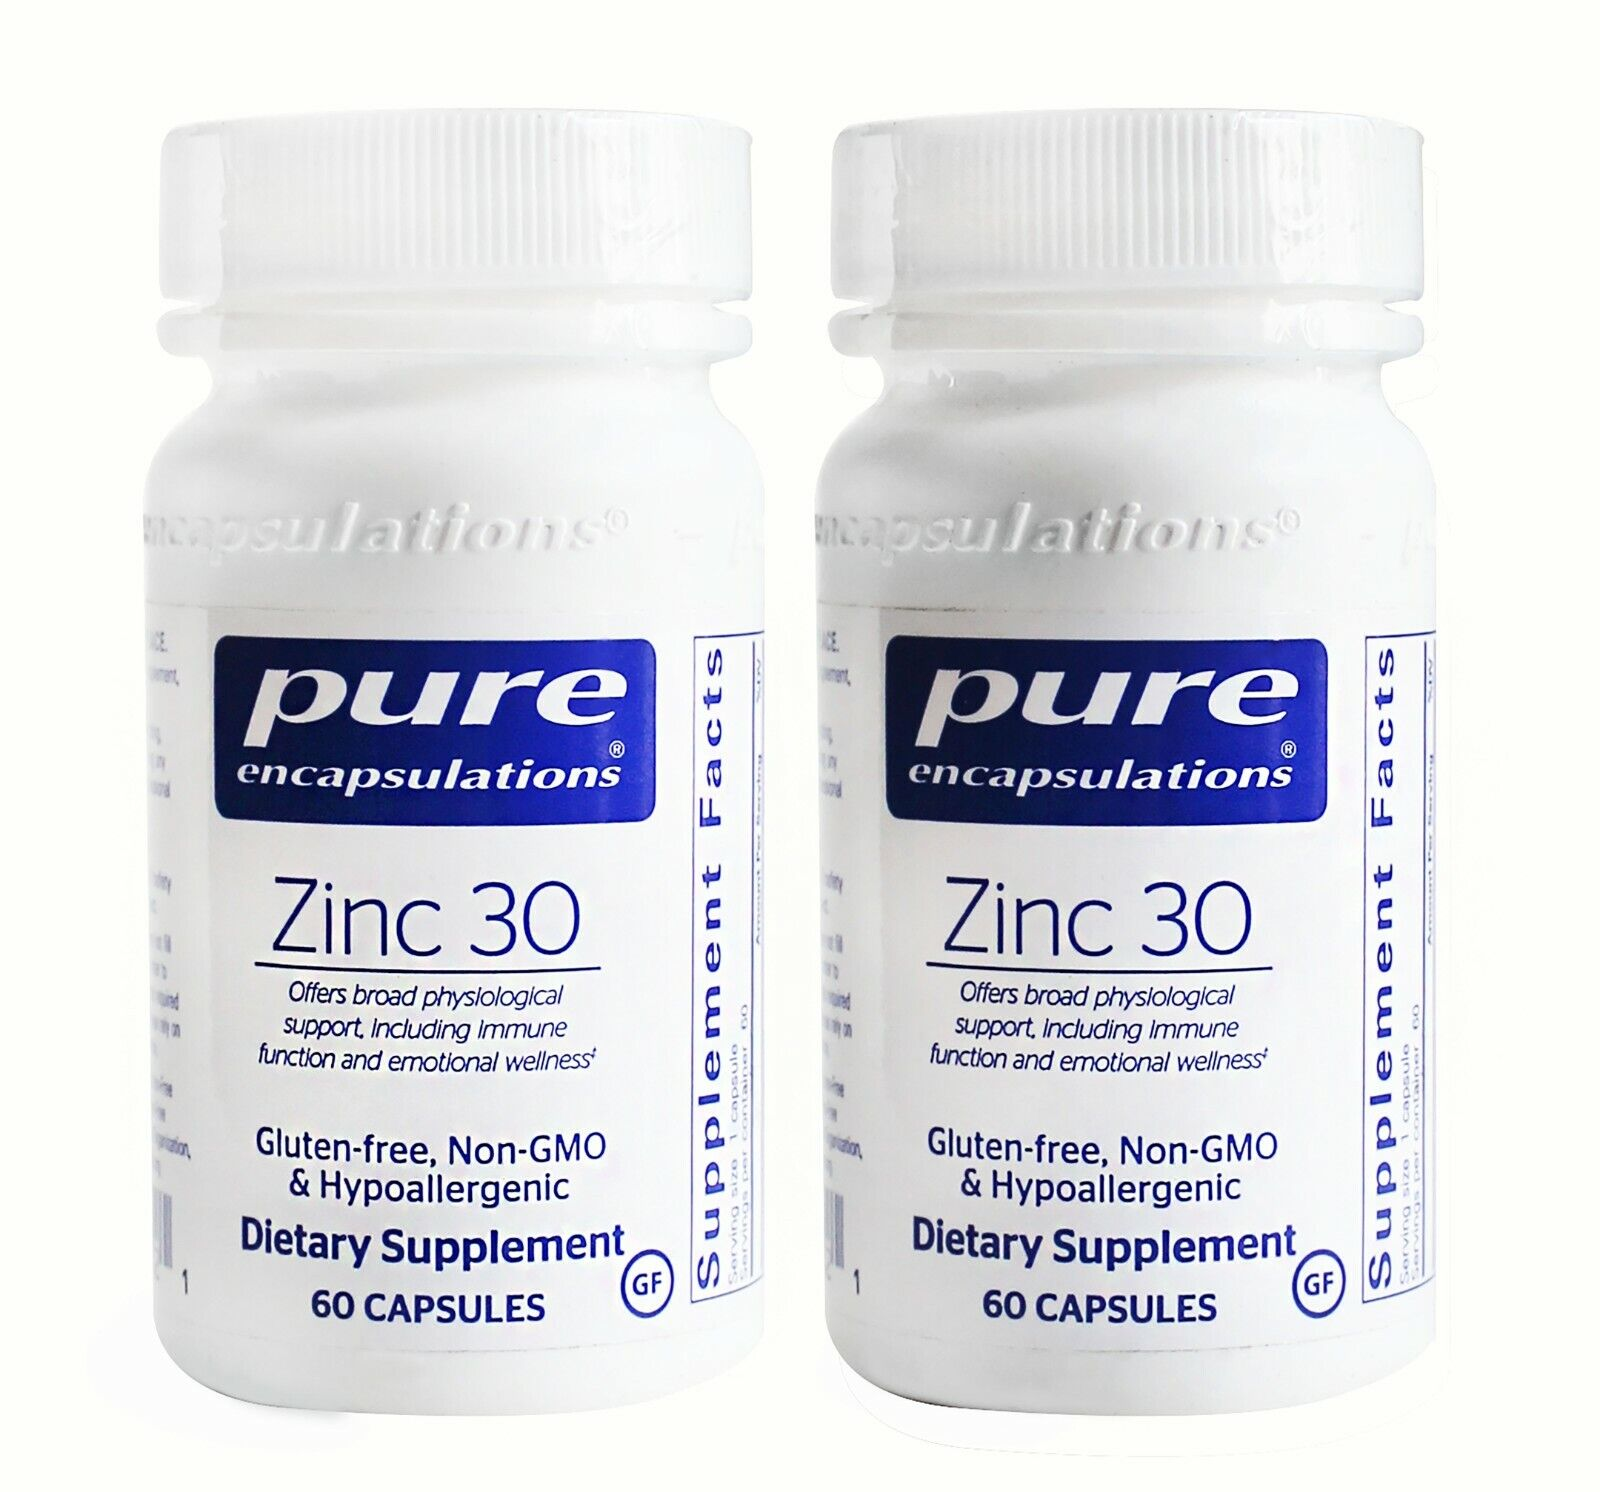 2 Bottles Pure Encapsulations Zinc 30 Dietary Supplement 120 Capsules 4/2023